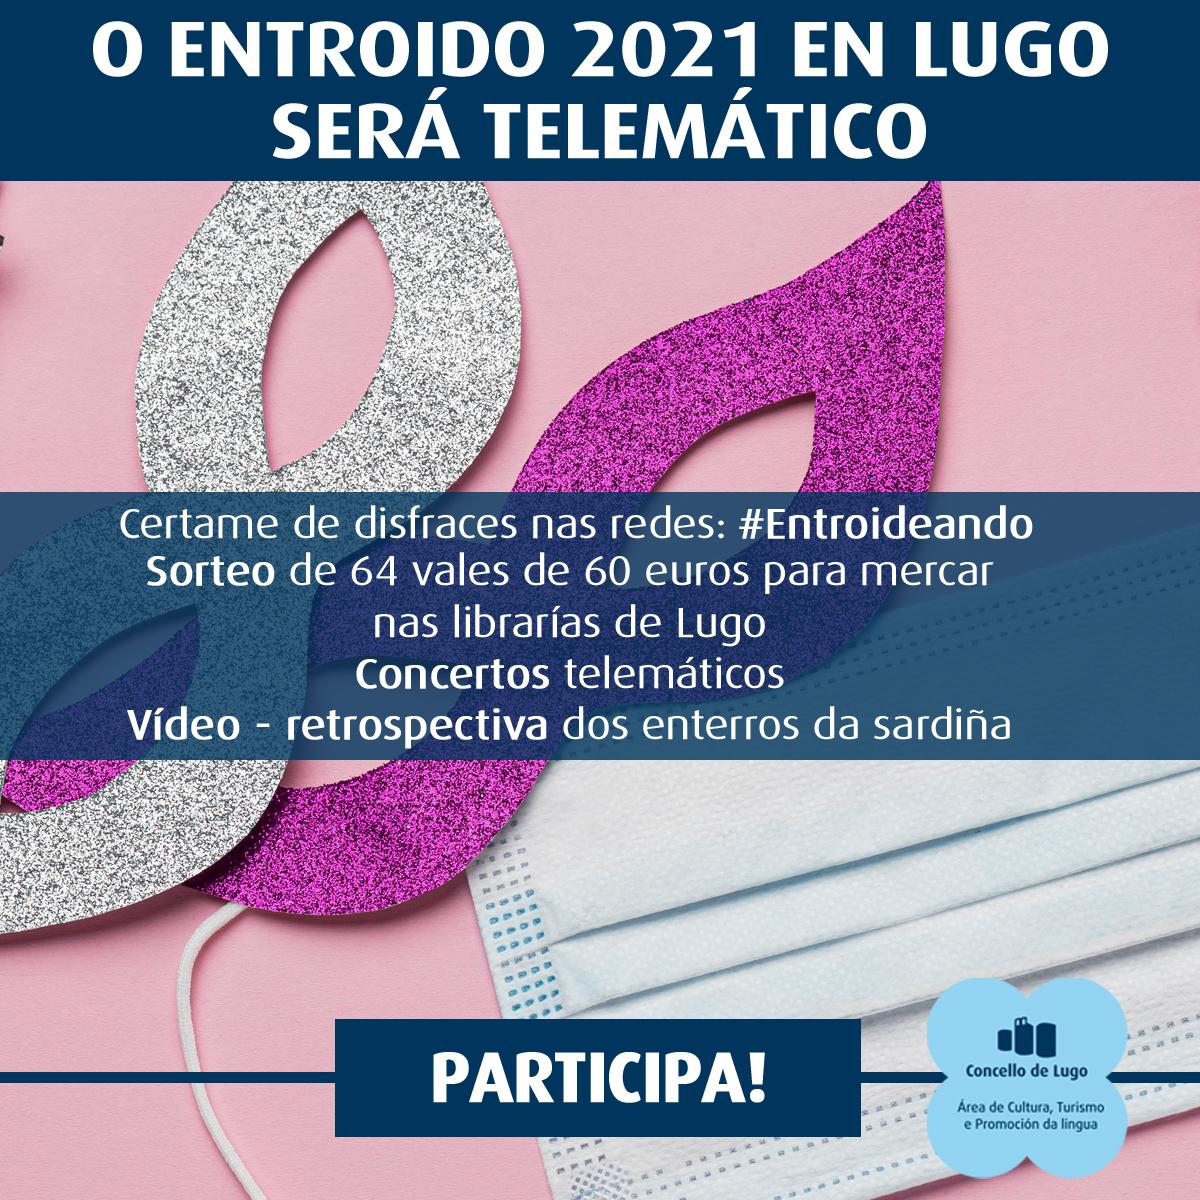 Entroideando Lugo 2021 - Programa Cultura e Turismo